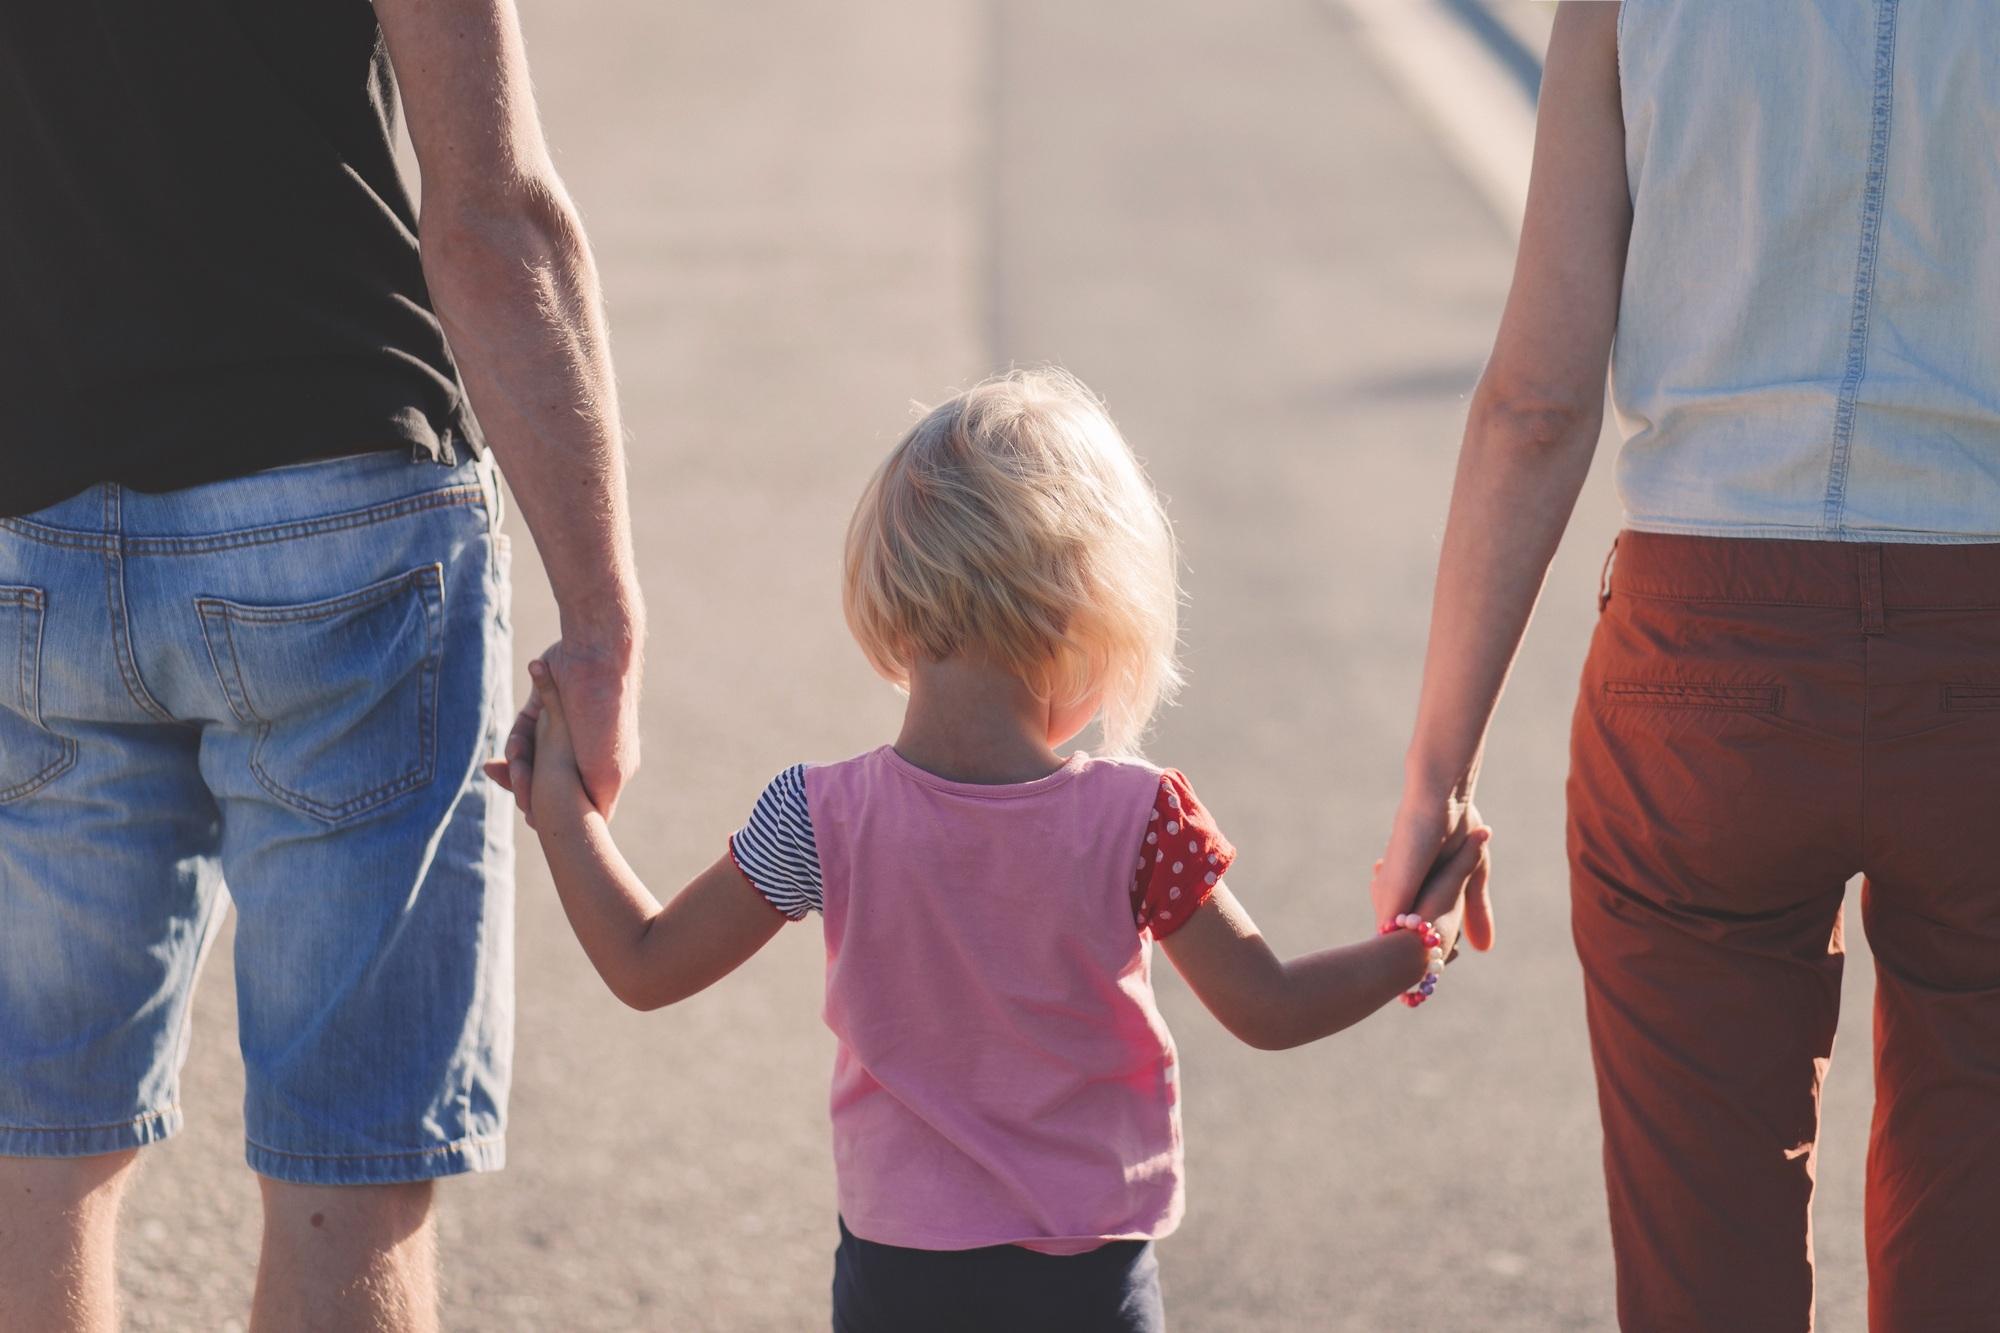 Impact Of Intergenerational Trauma On Mental Health